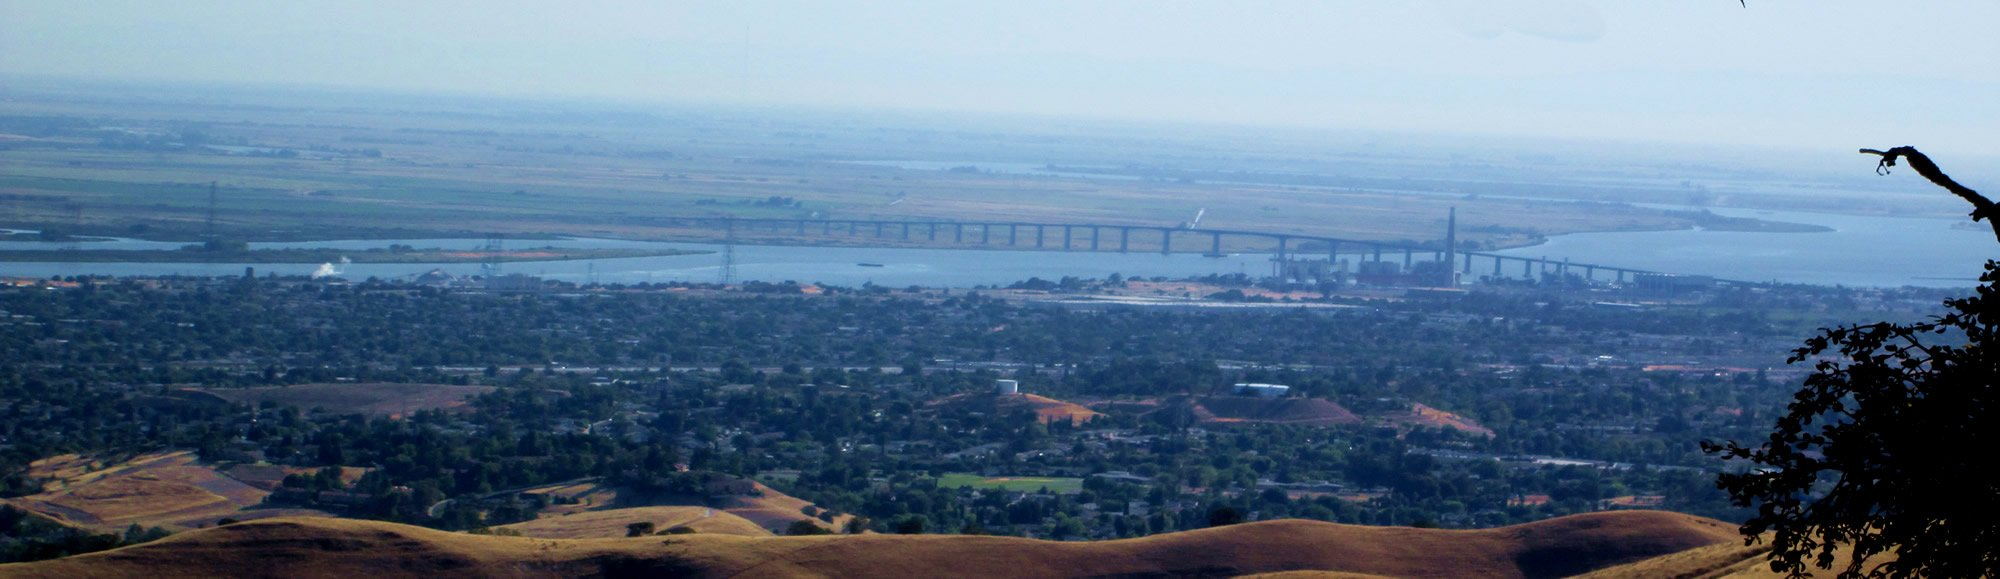 Antioch Bridge